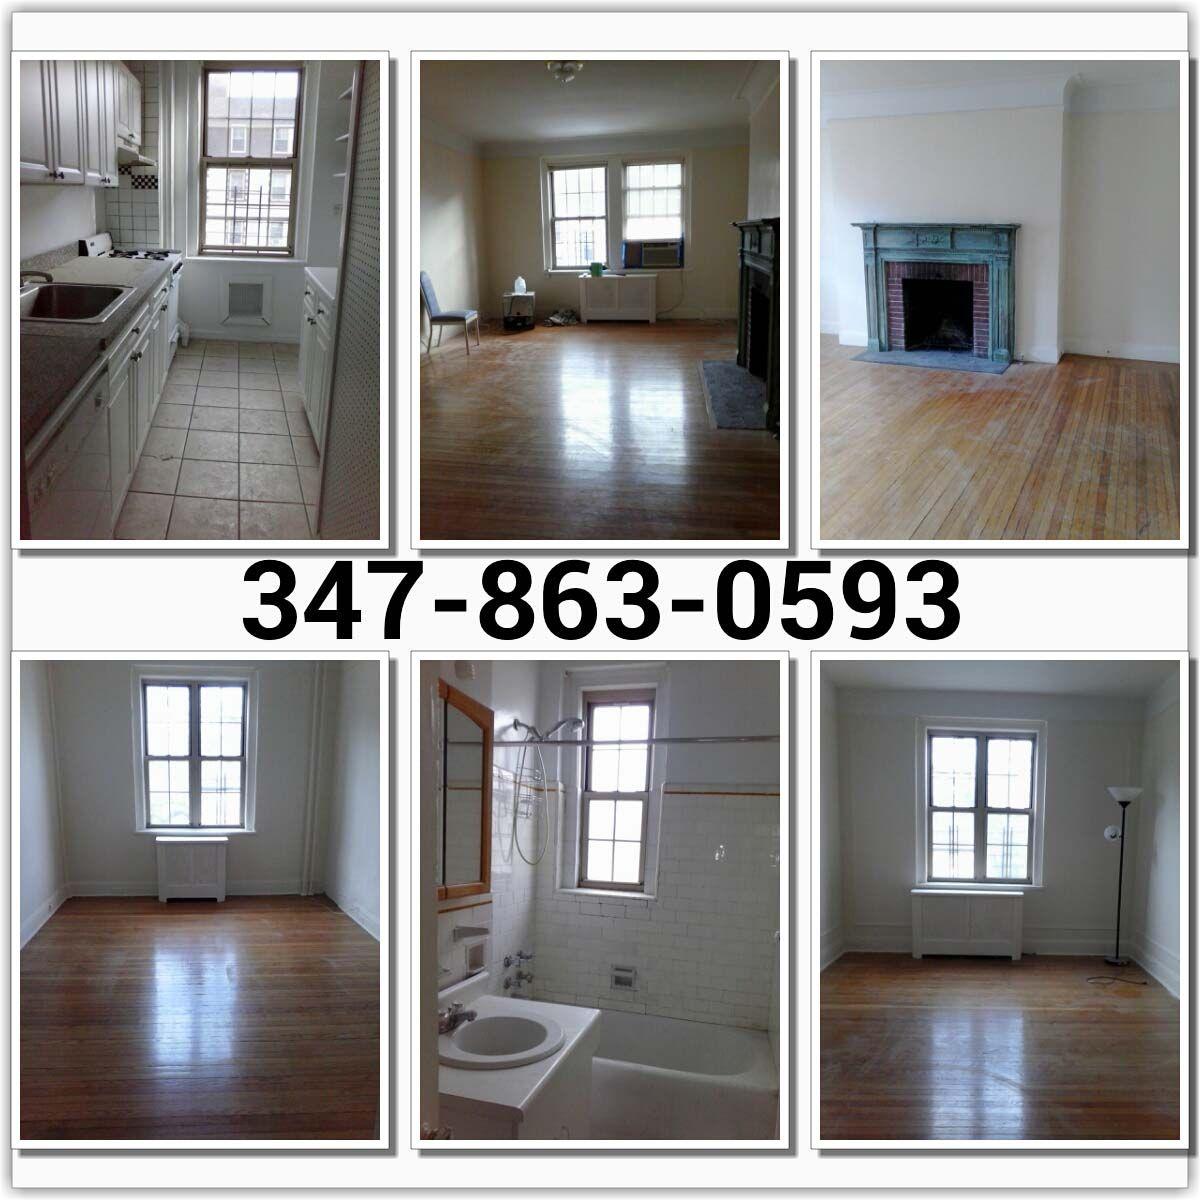 2 Bedroom apartment for rent in Kew Gardens, Queens ny